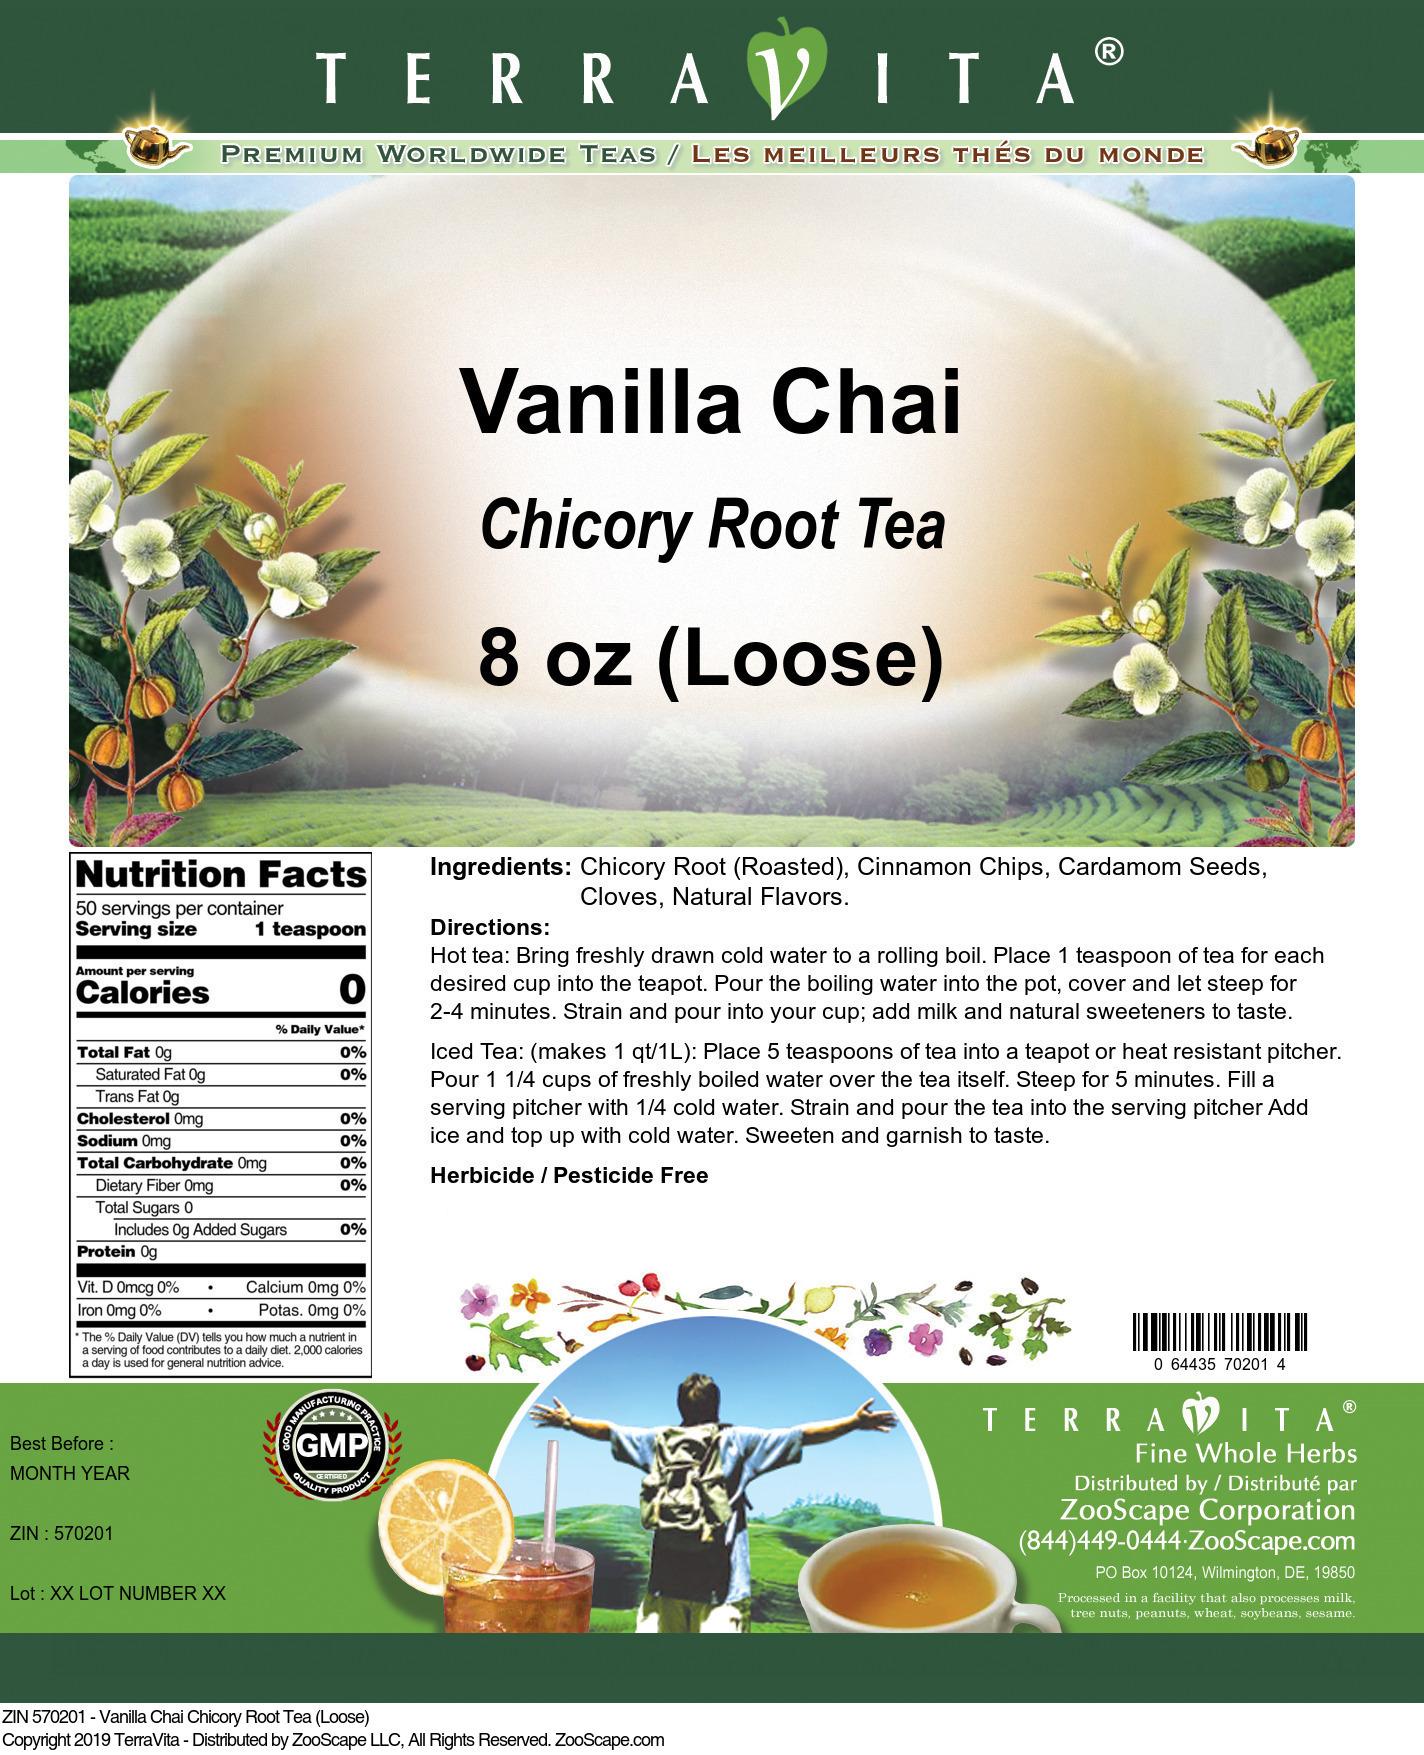 Vanilla Chai Chicory Root Tea (Loose)